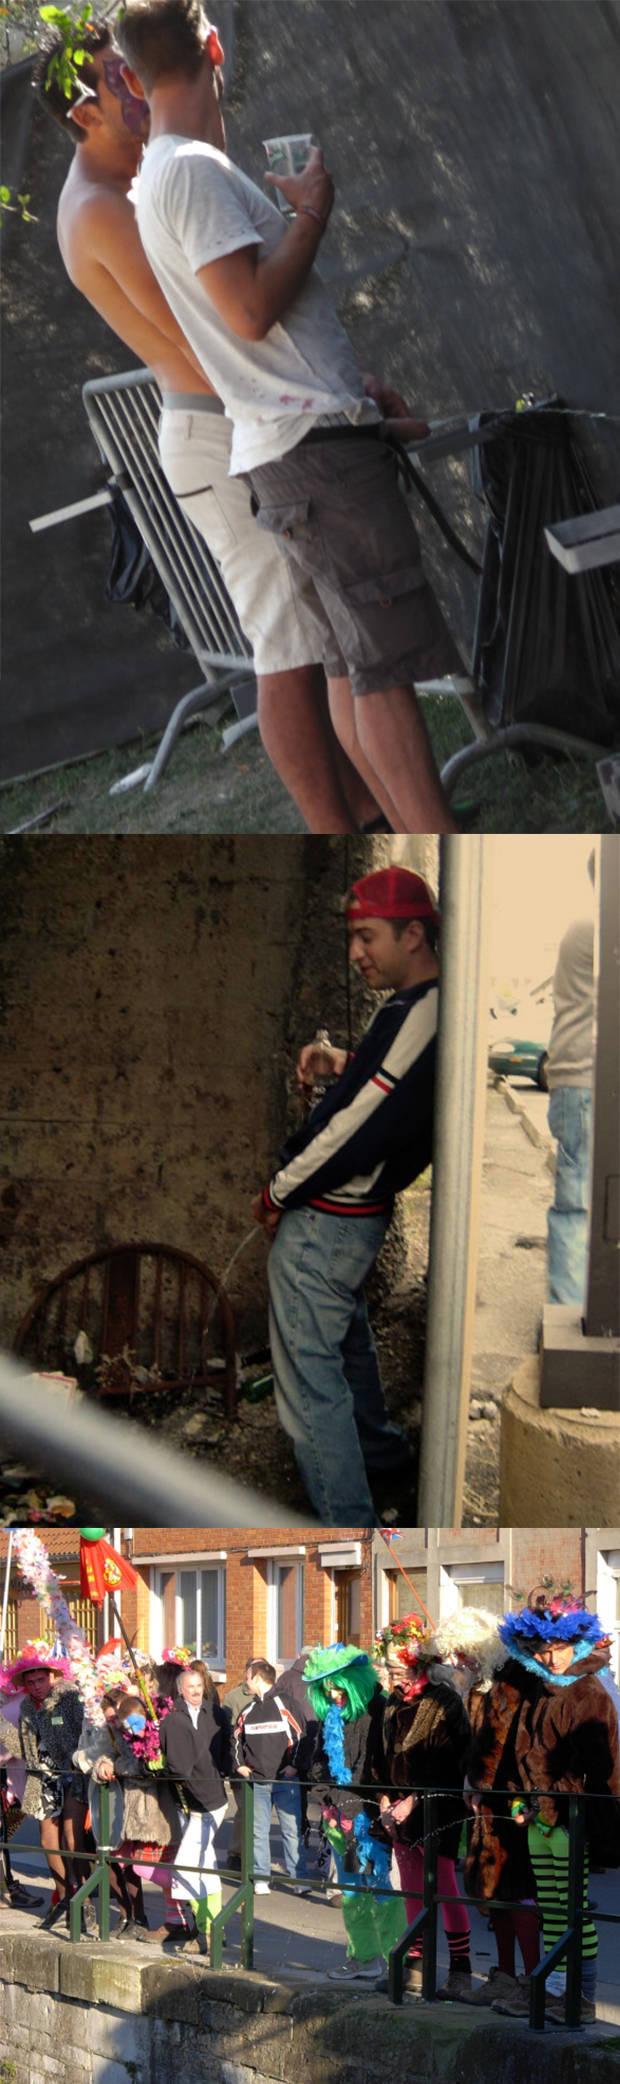 drunk guys peeing in public